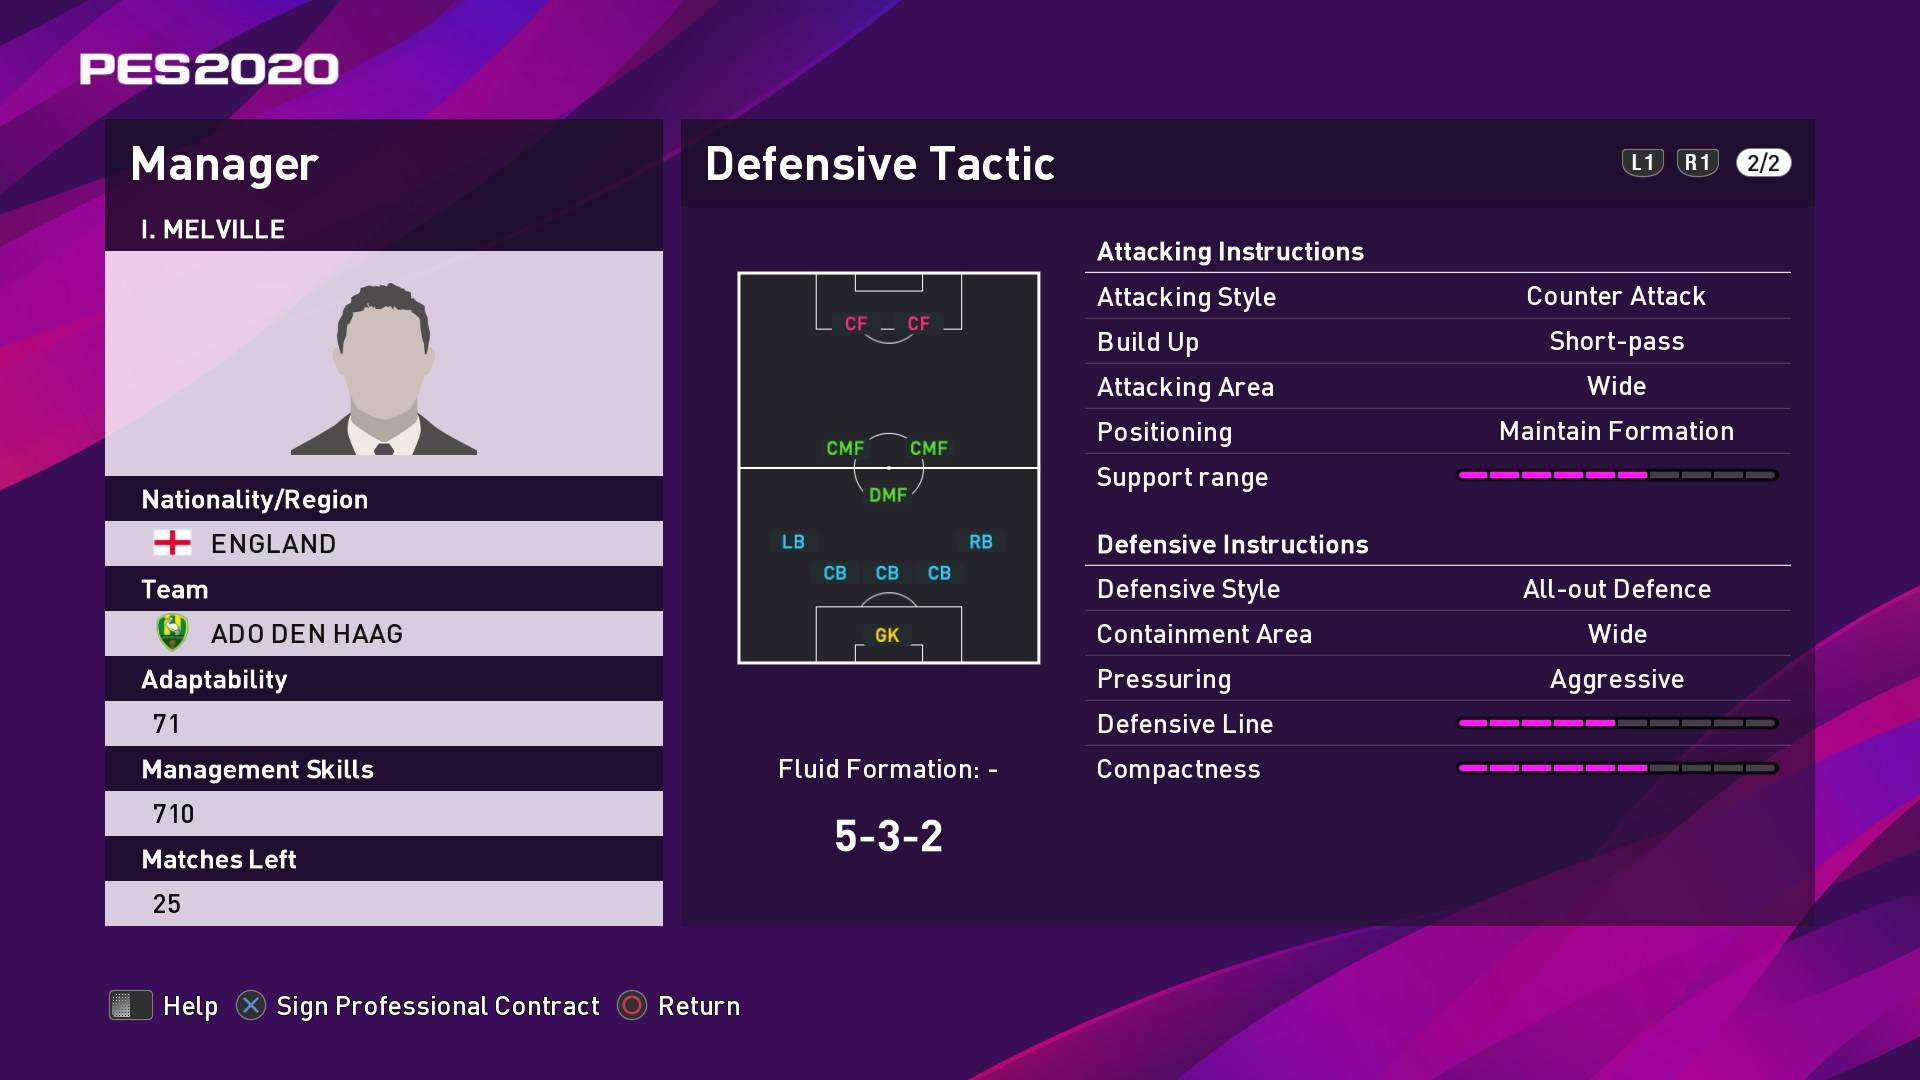 I. Melville (Alan Pardew) Defensive Tactic in PES 2020 myClub